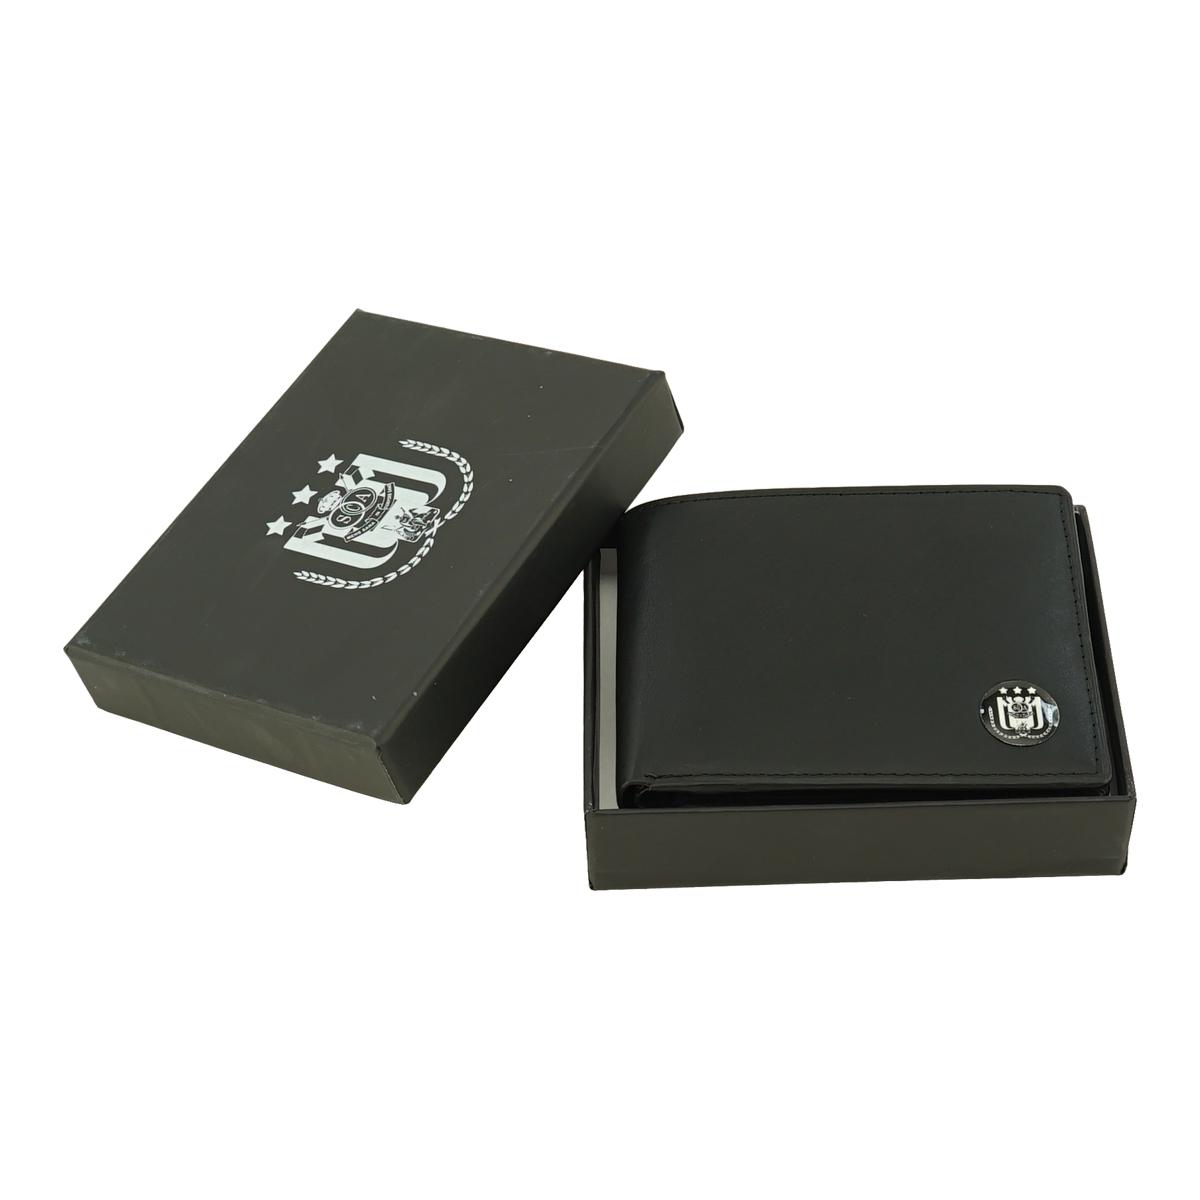 RSCA Wallet Leather Gravure